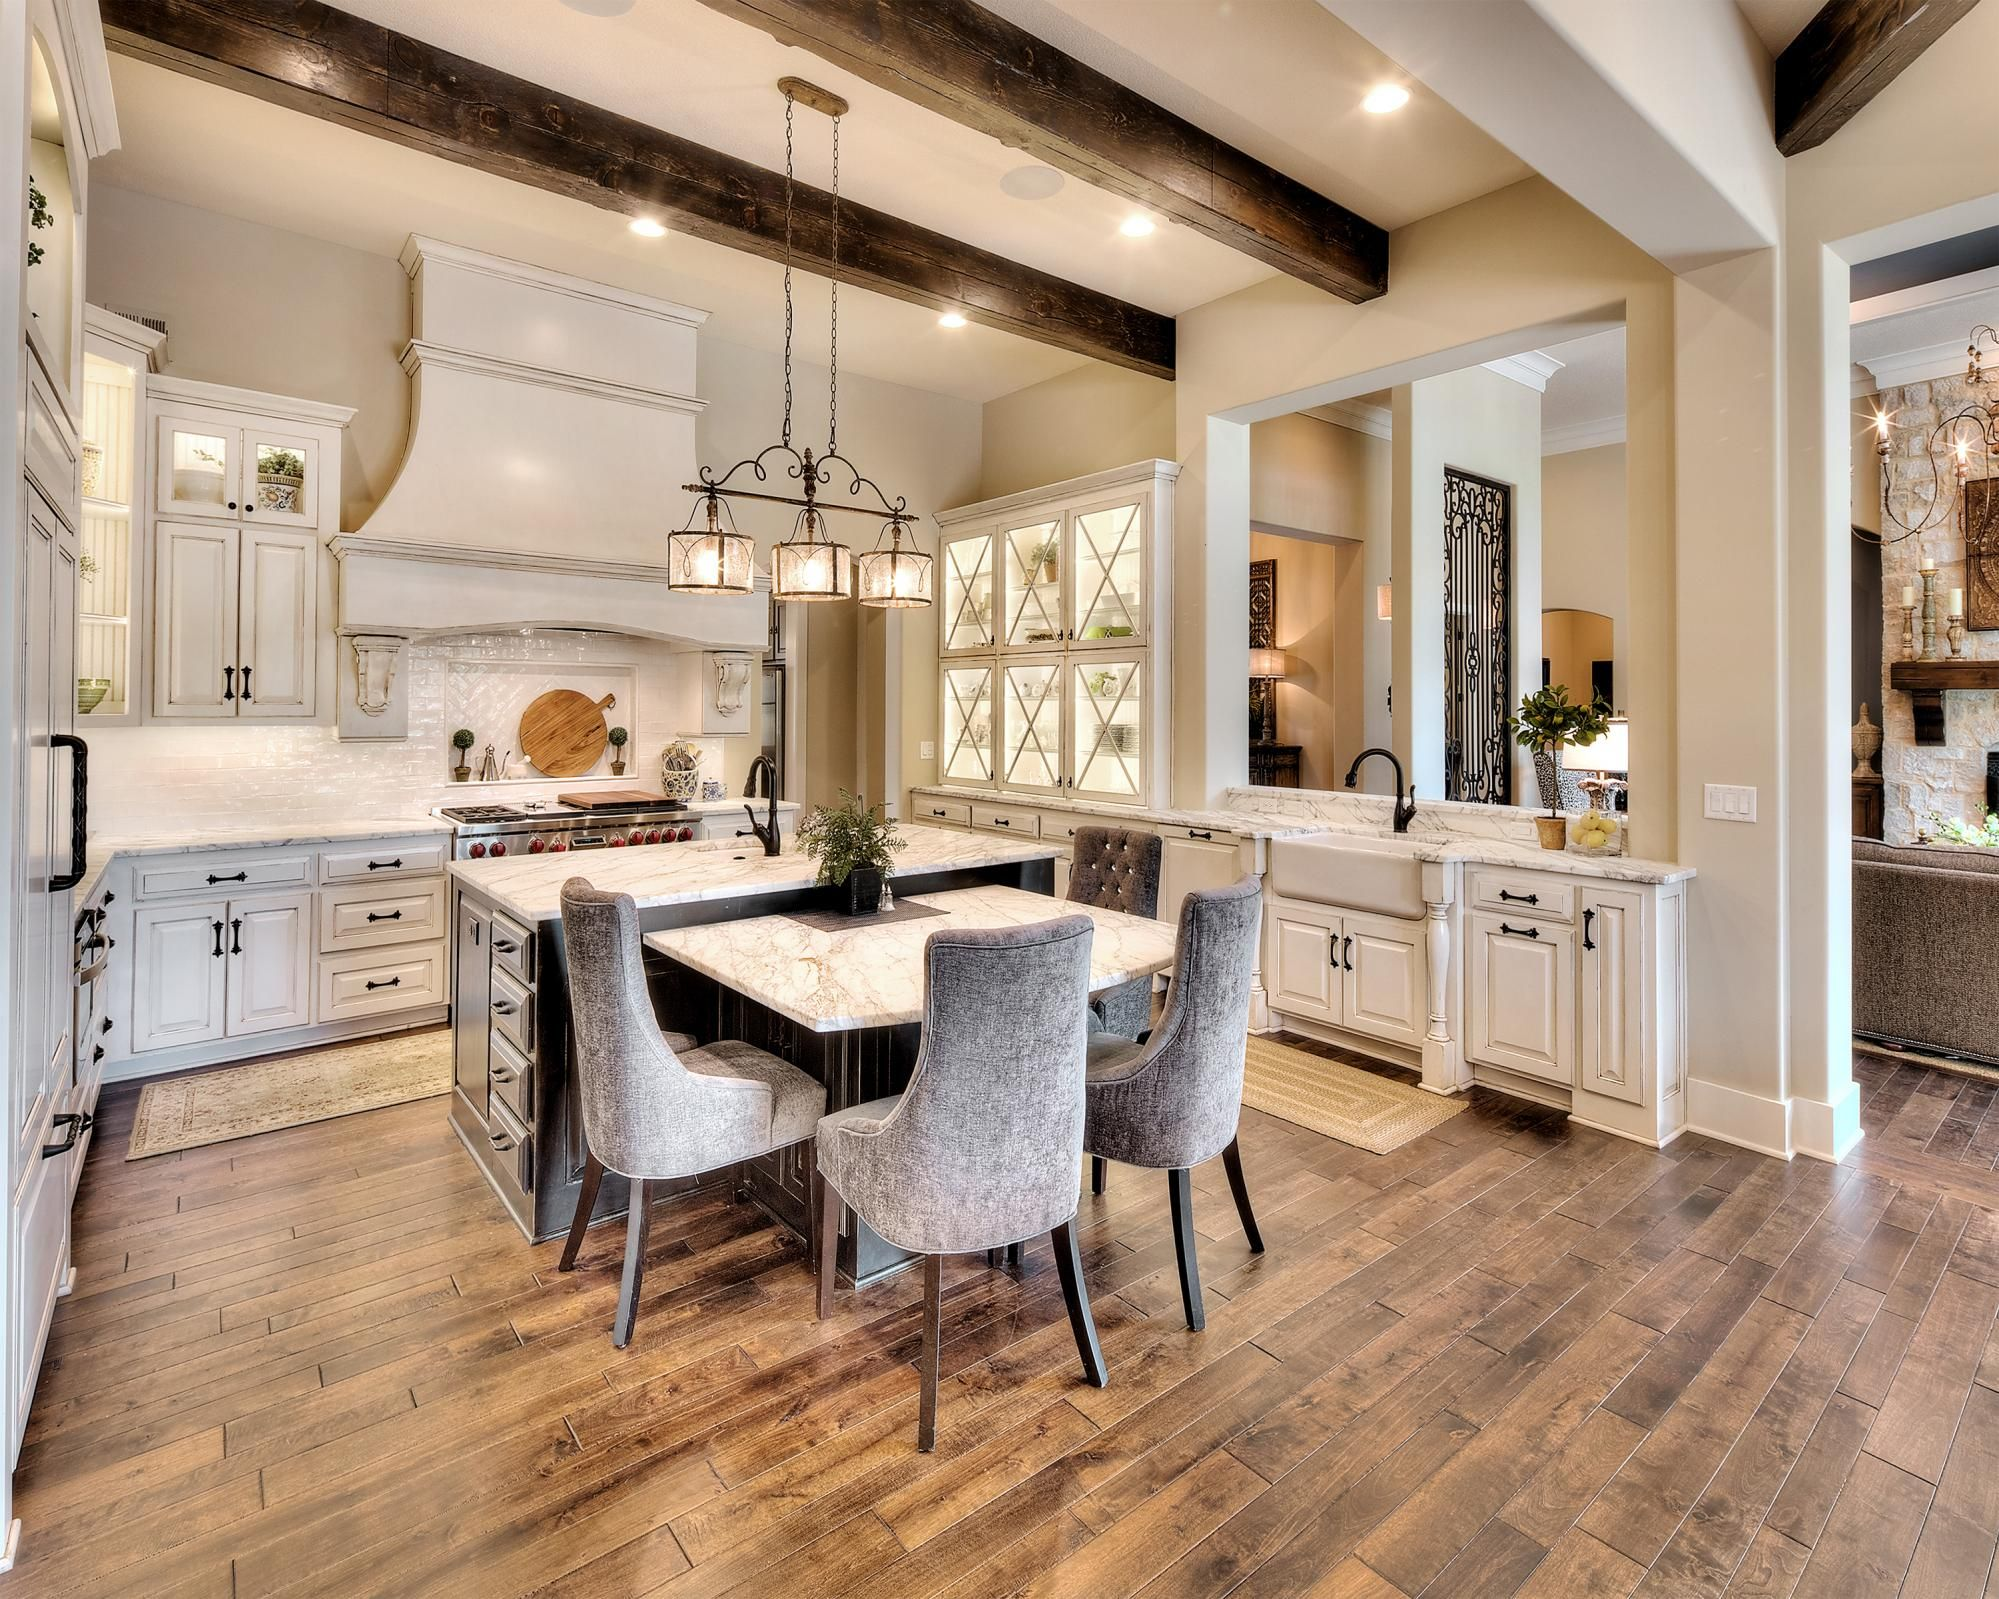 Kitchen Dining Photo Gallery Custom Homes In Kansas City Ks Starr Homes Home Home Decor Decor Interior Design